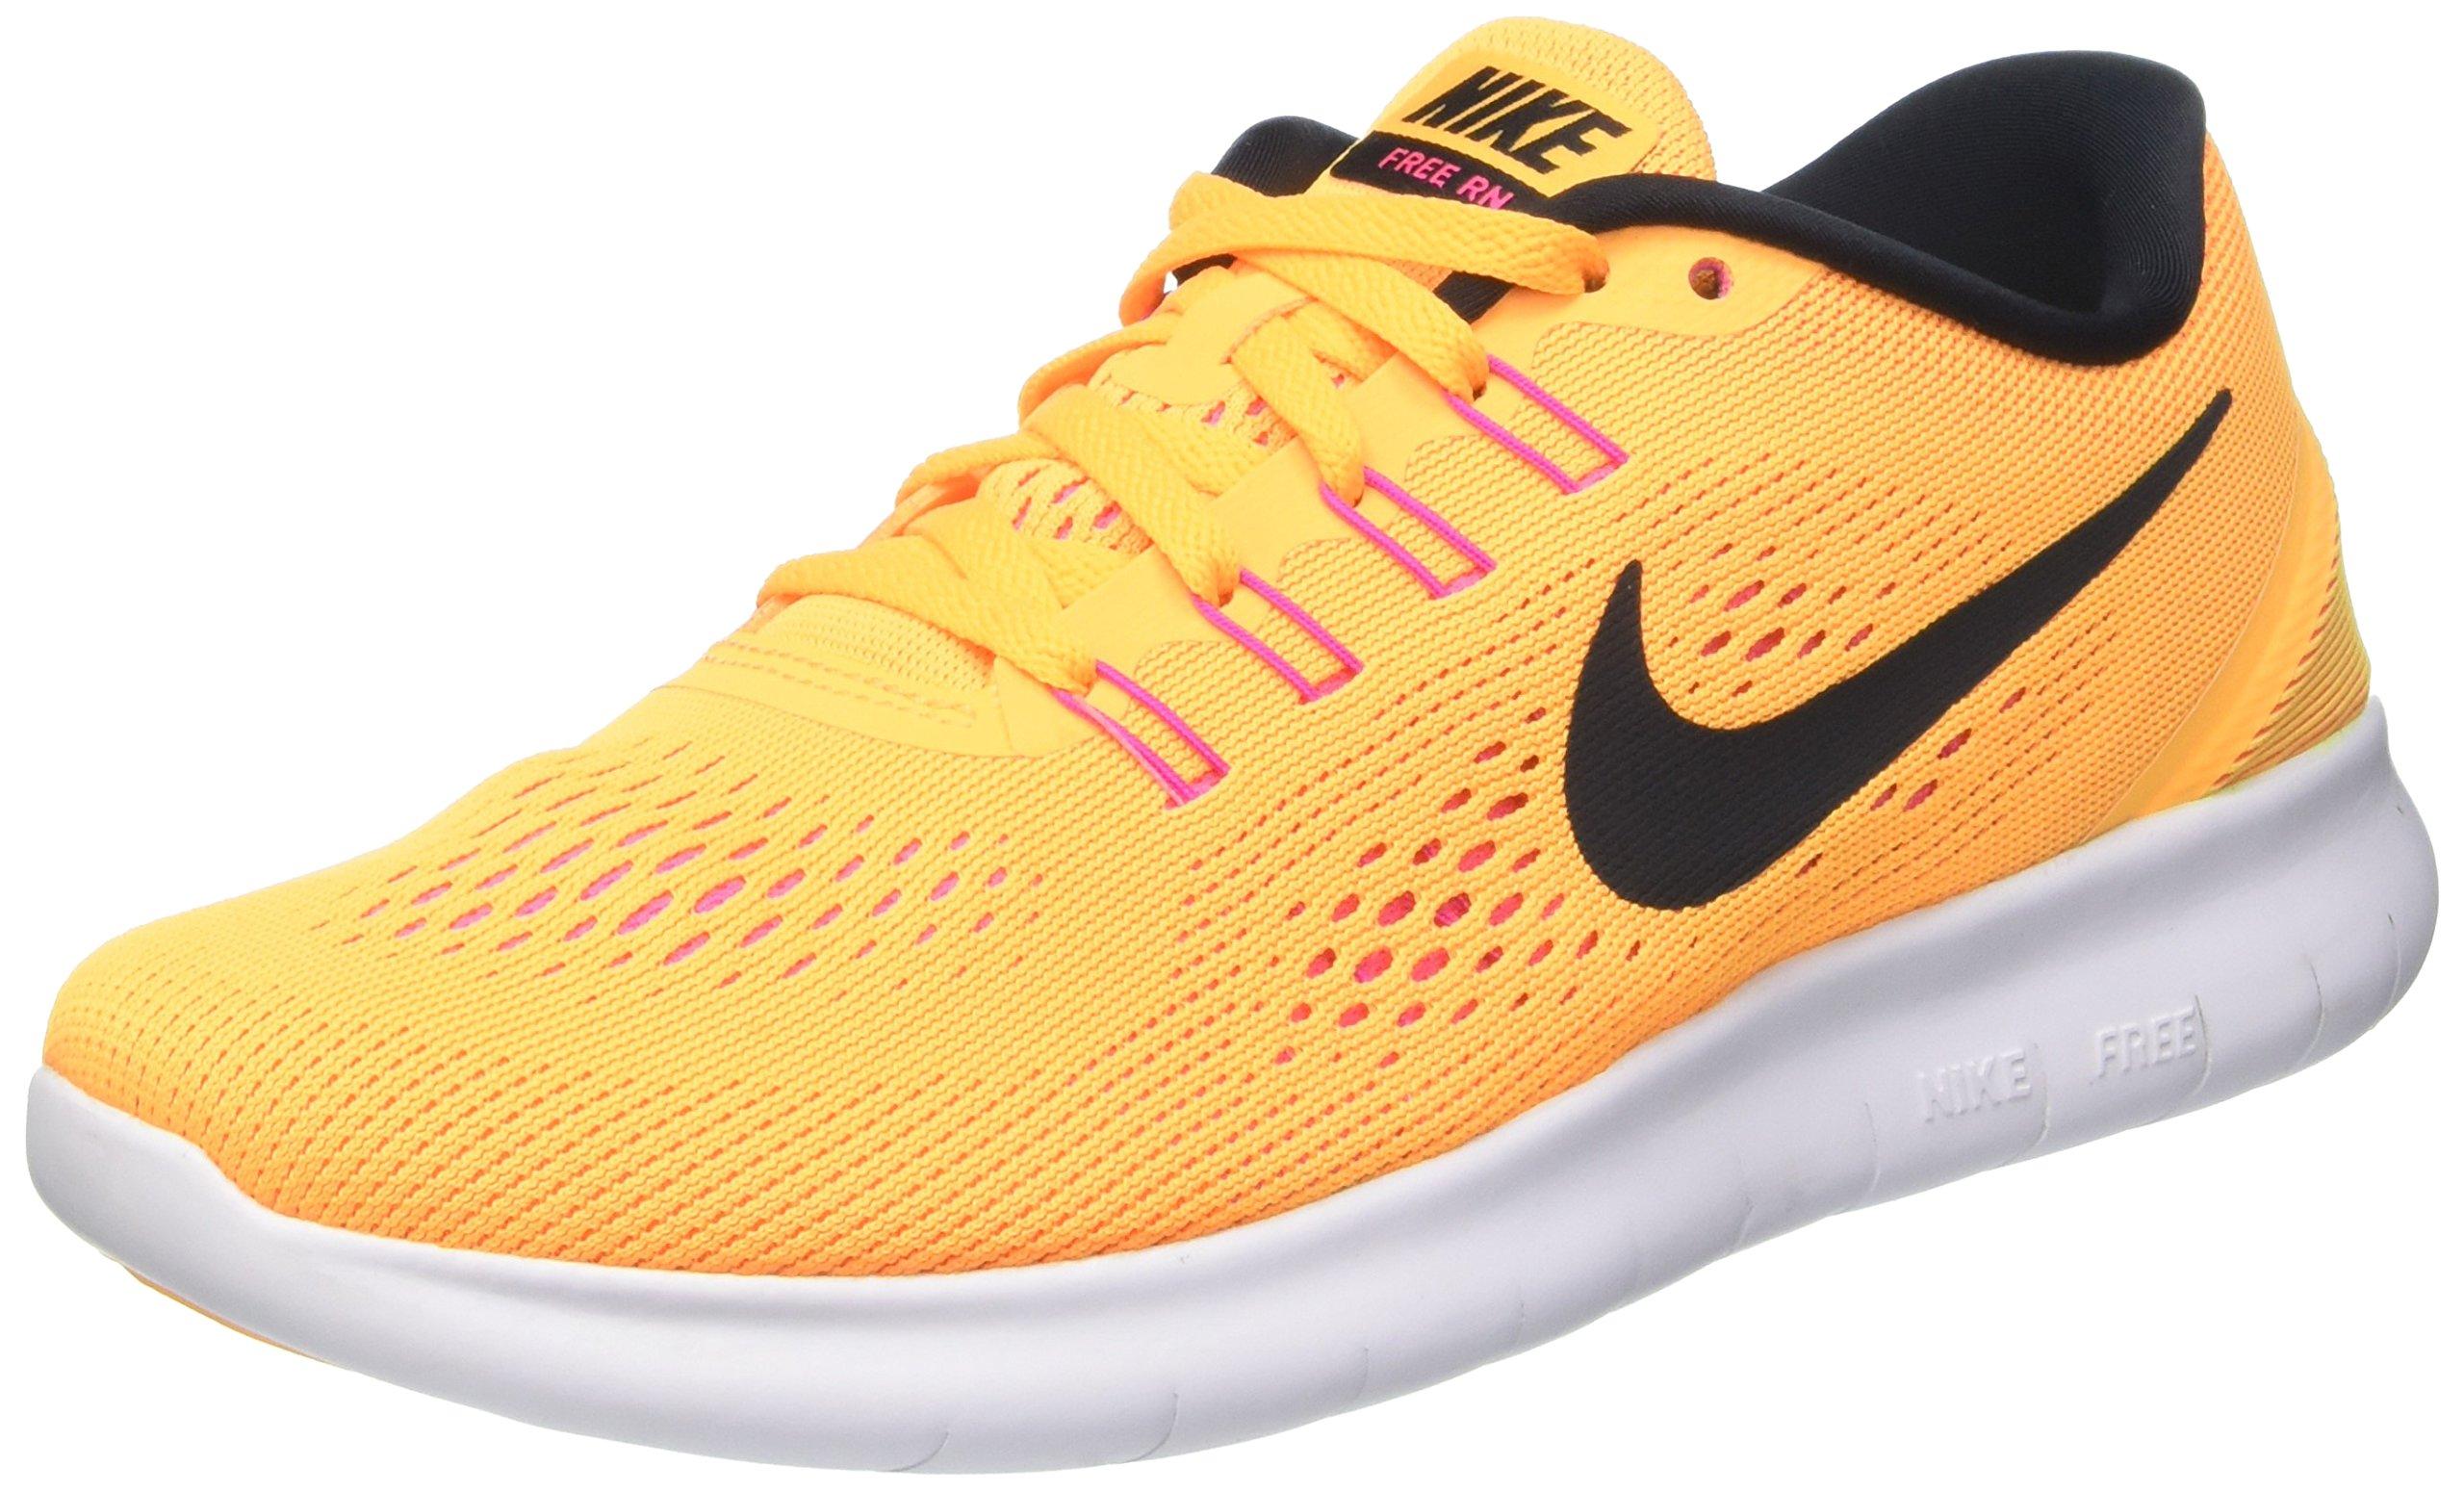 Nike Womens Free RN Running Sneakers Lightweight Casual Shoes 831509 (9 M US, Laser Orange/Pink Blast/Total Orange/Black)